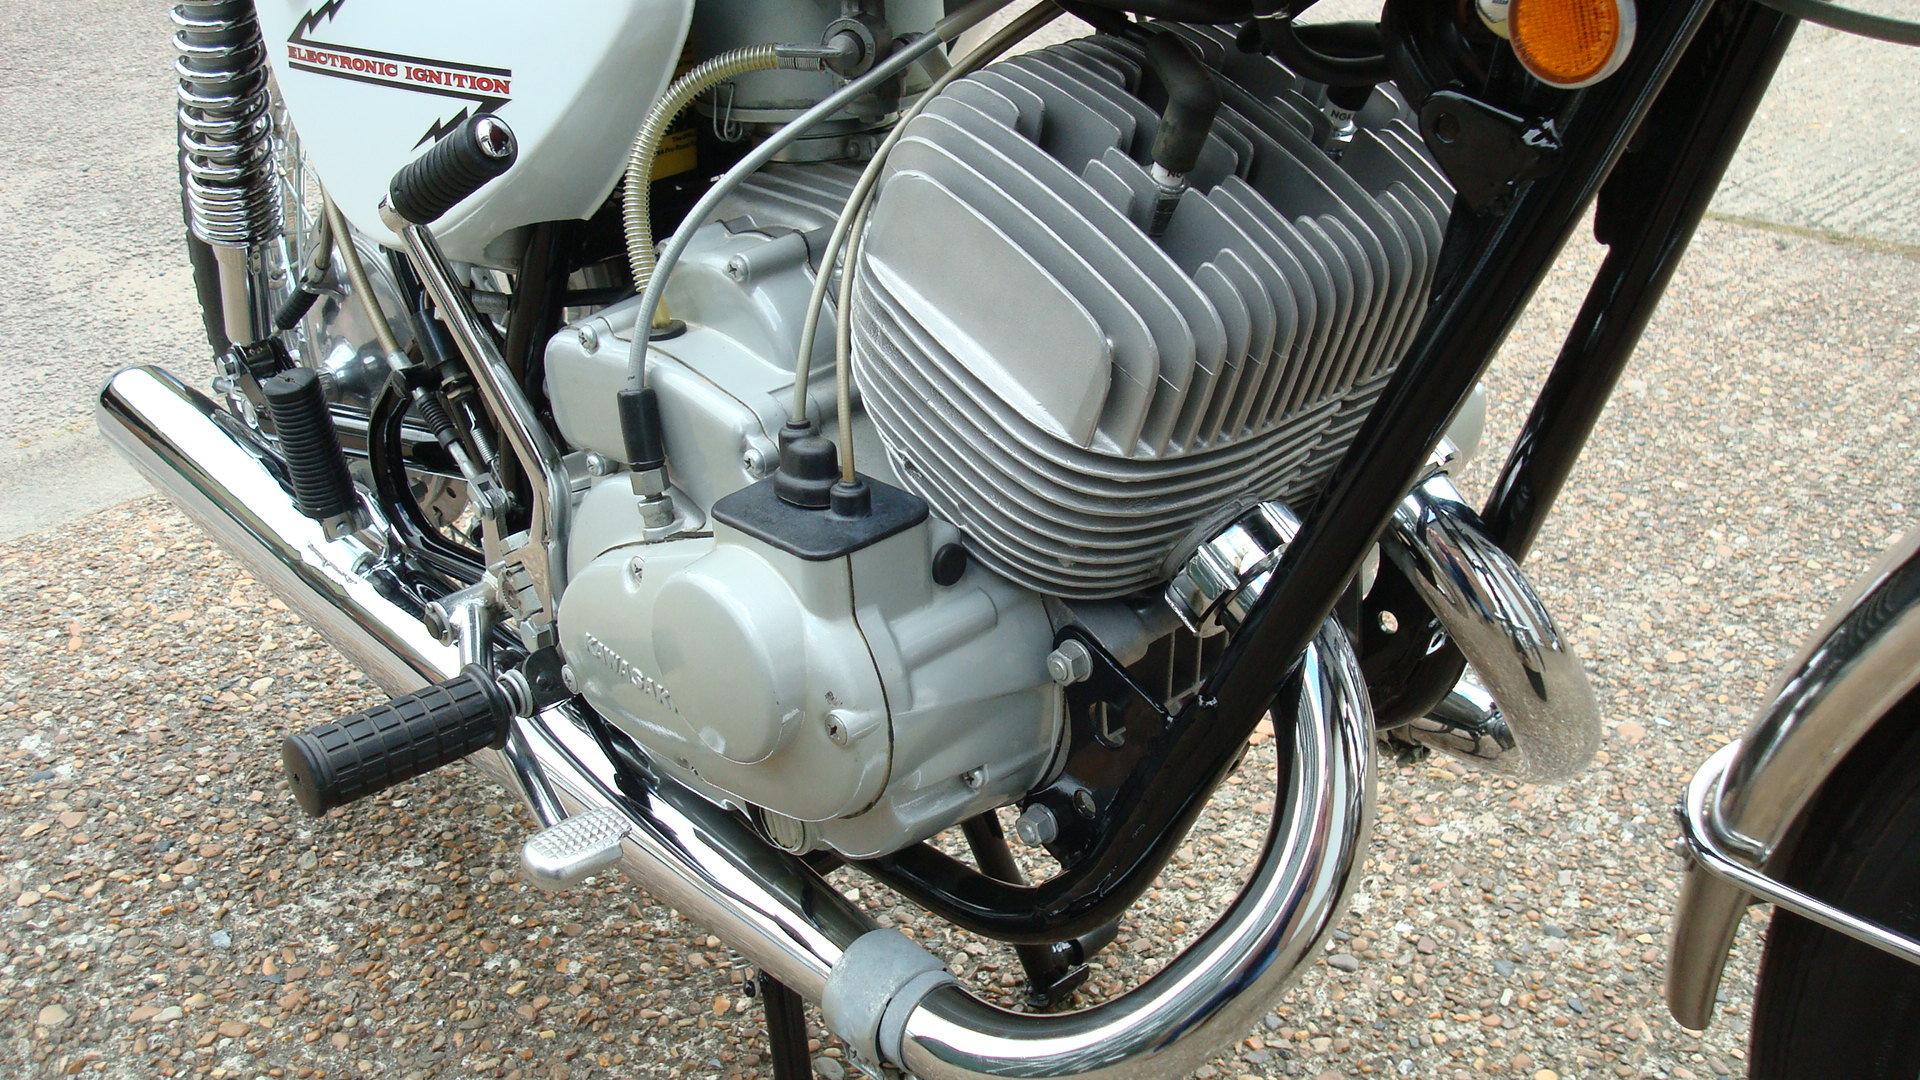 Kawasaki A1A Samurai 250 1970-J **SHOW STANDARD,RESTORED** For Sale (picture 3 of 6)